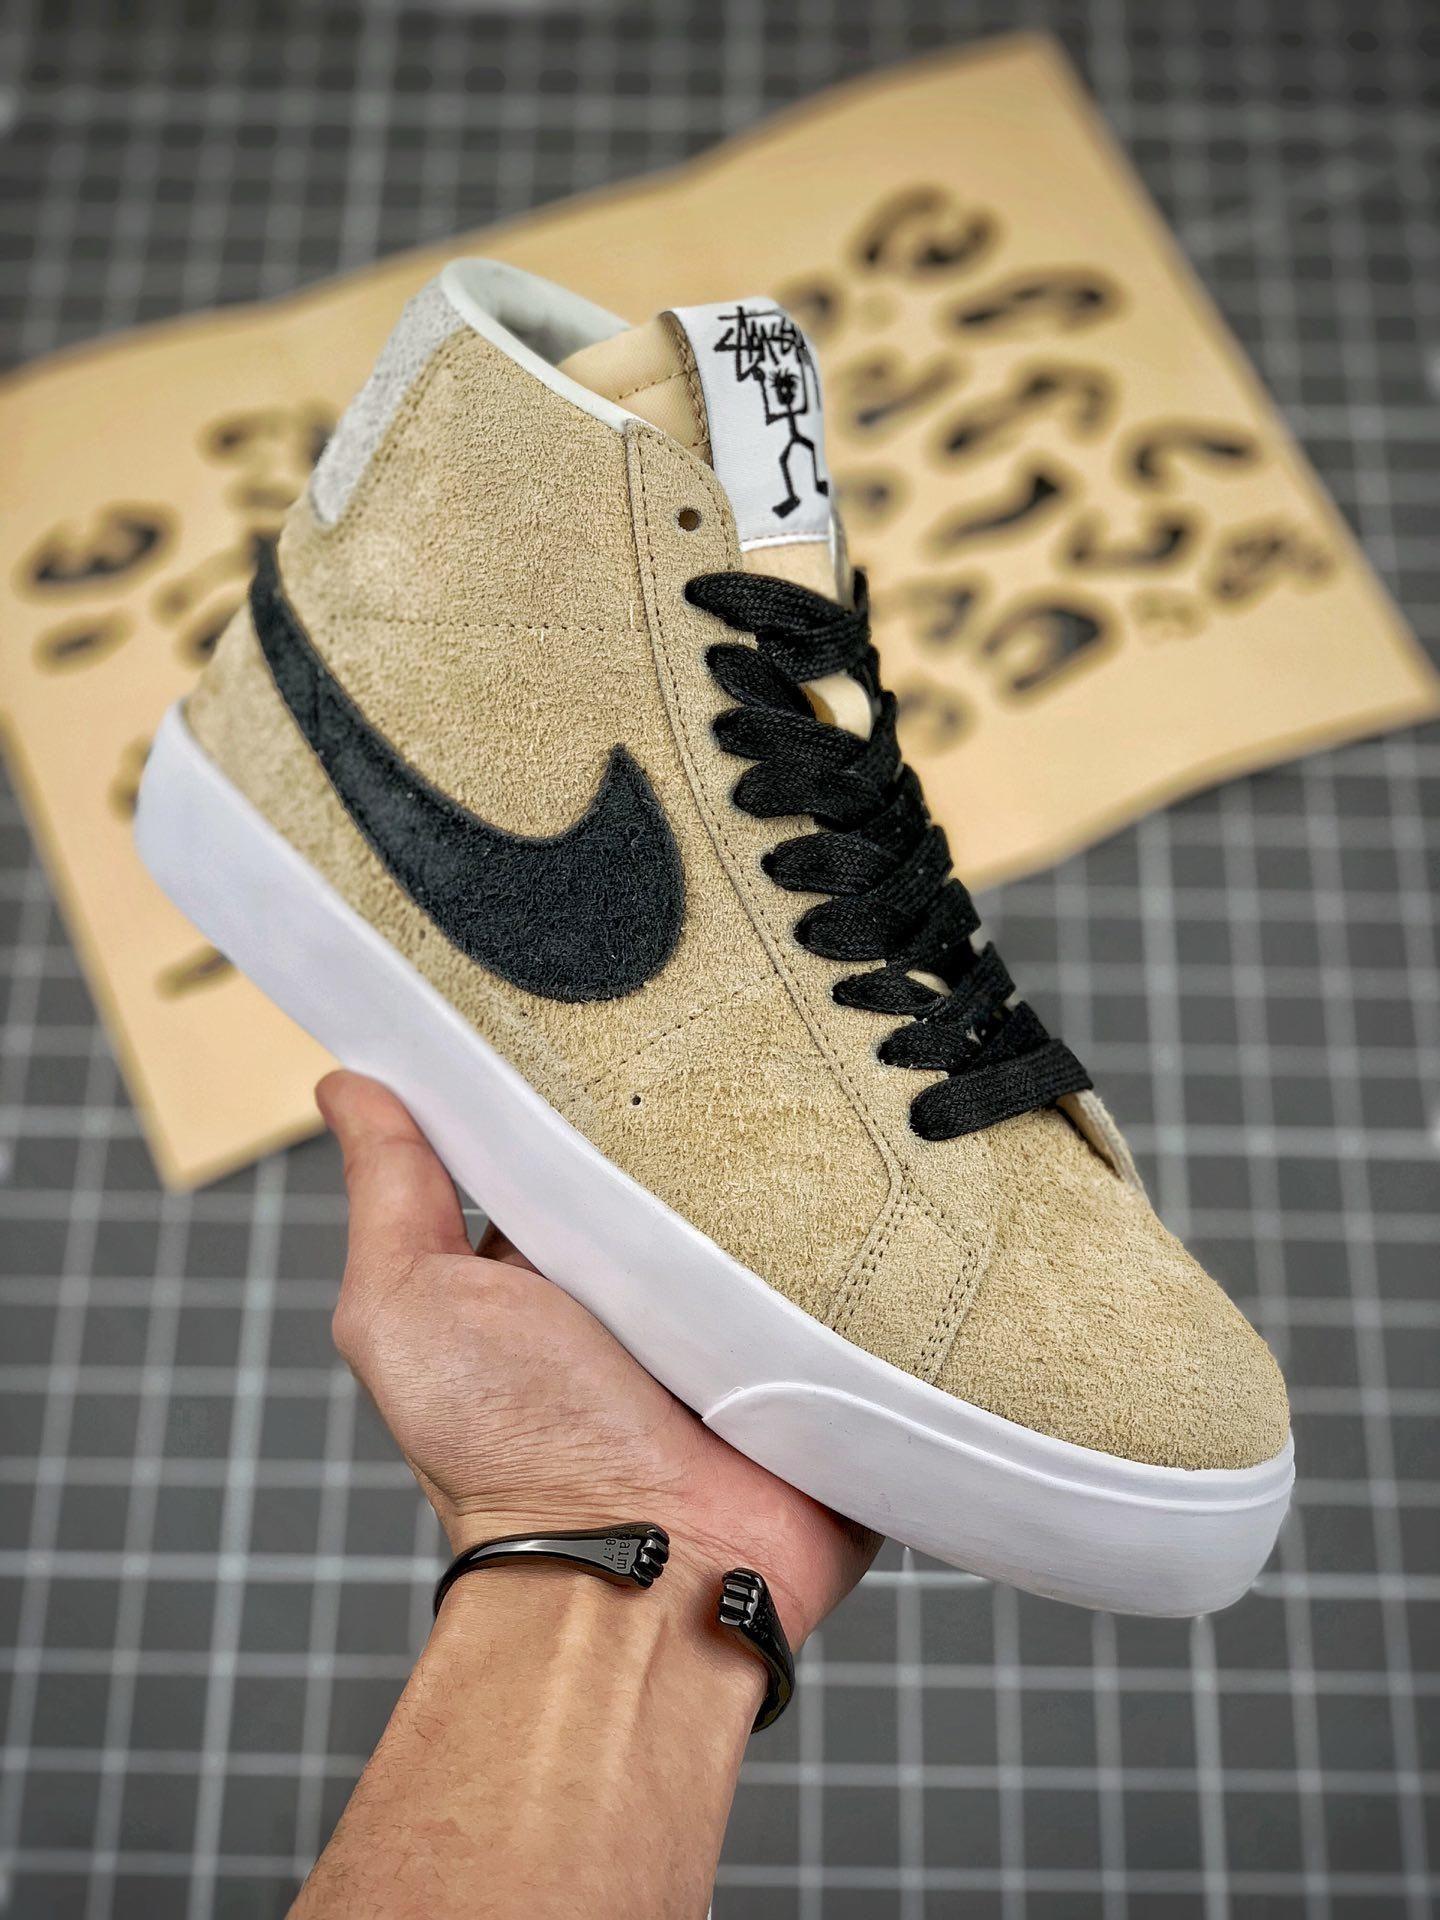 new styles 73aac 7284a 2019的Stüssy x Nike SB Zoom Blazer Mid AH6158-700 | NIKE